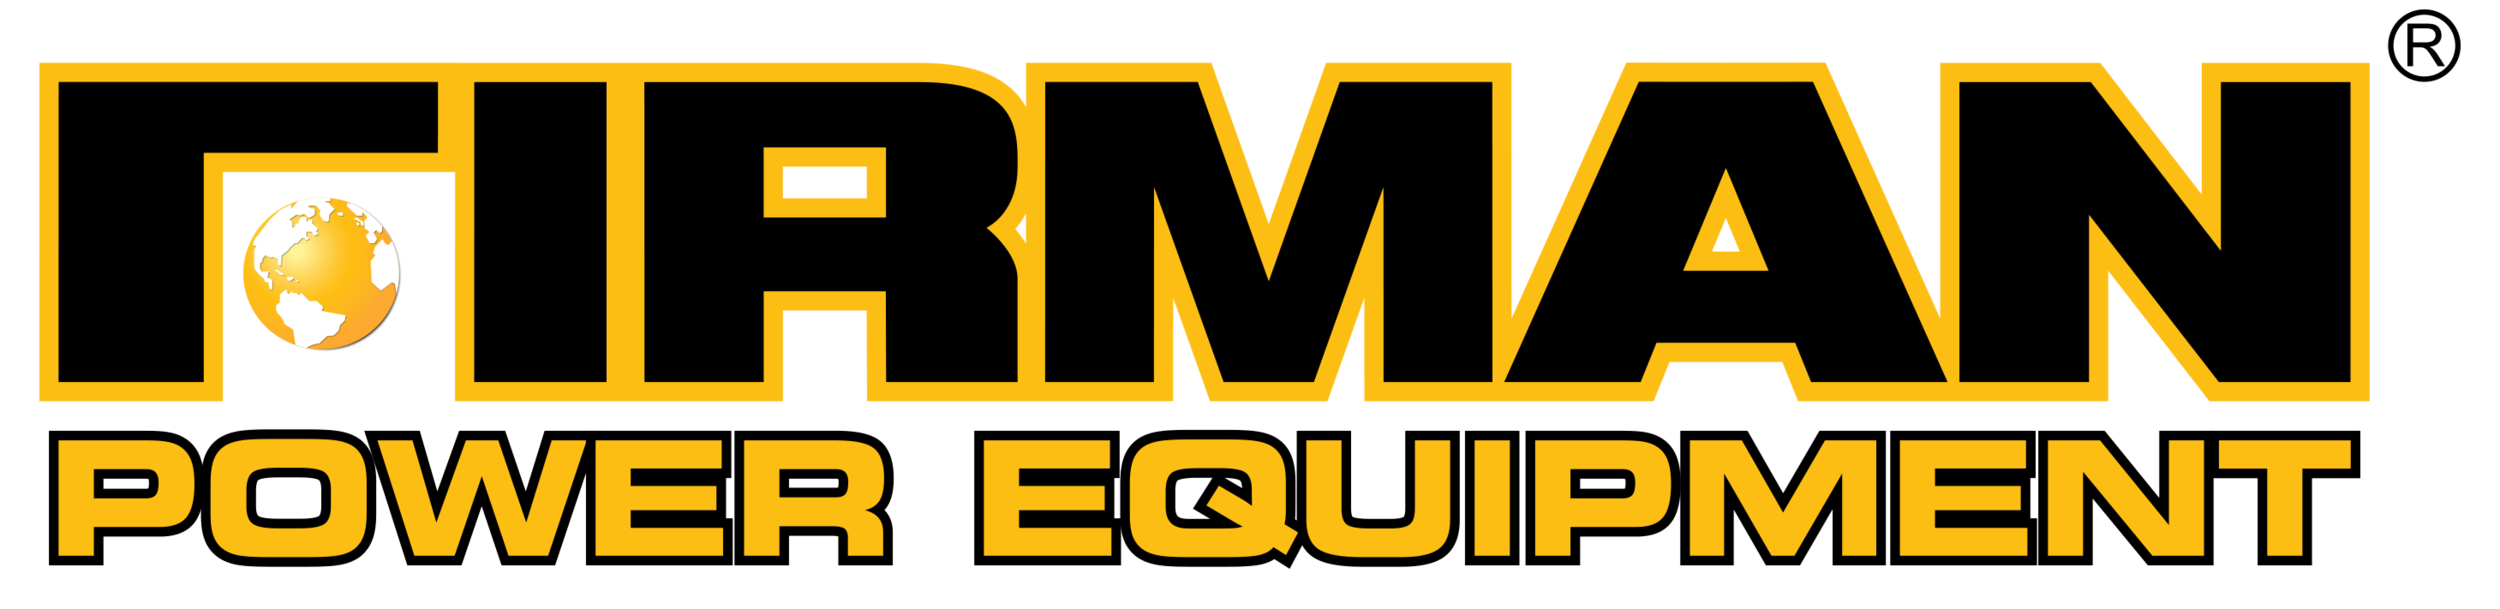 Firman Logo.Png